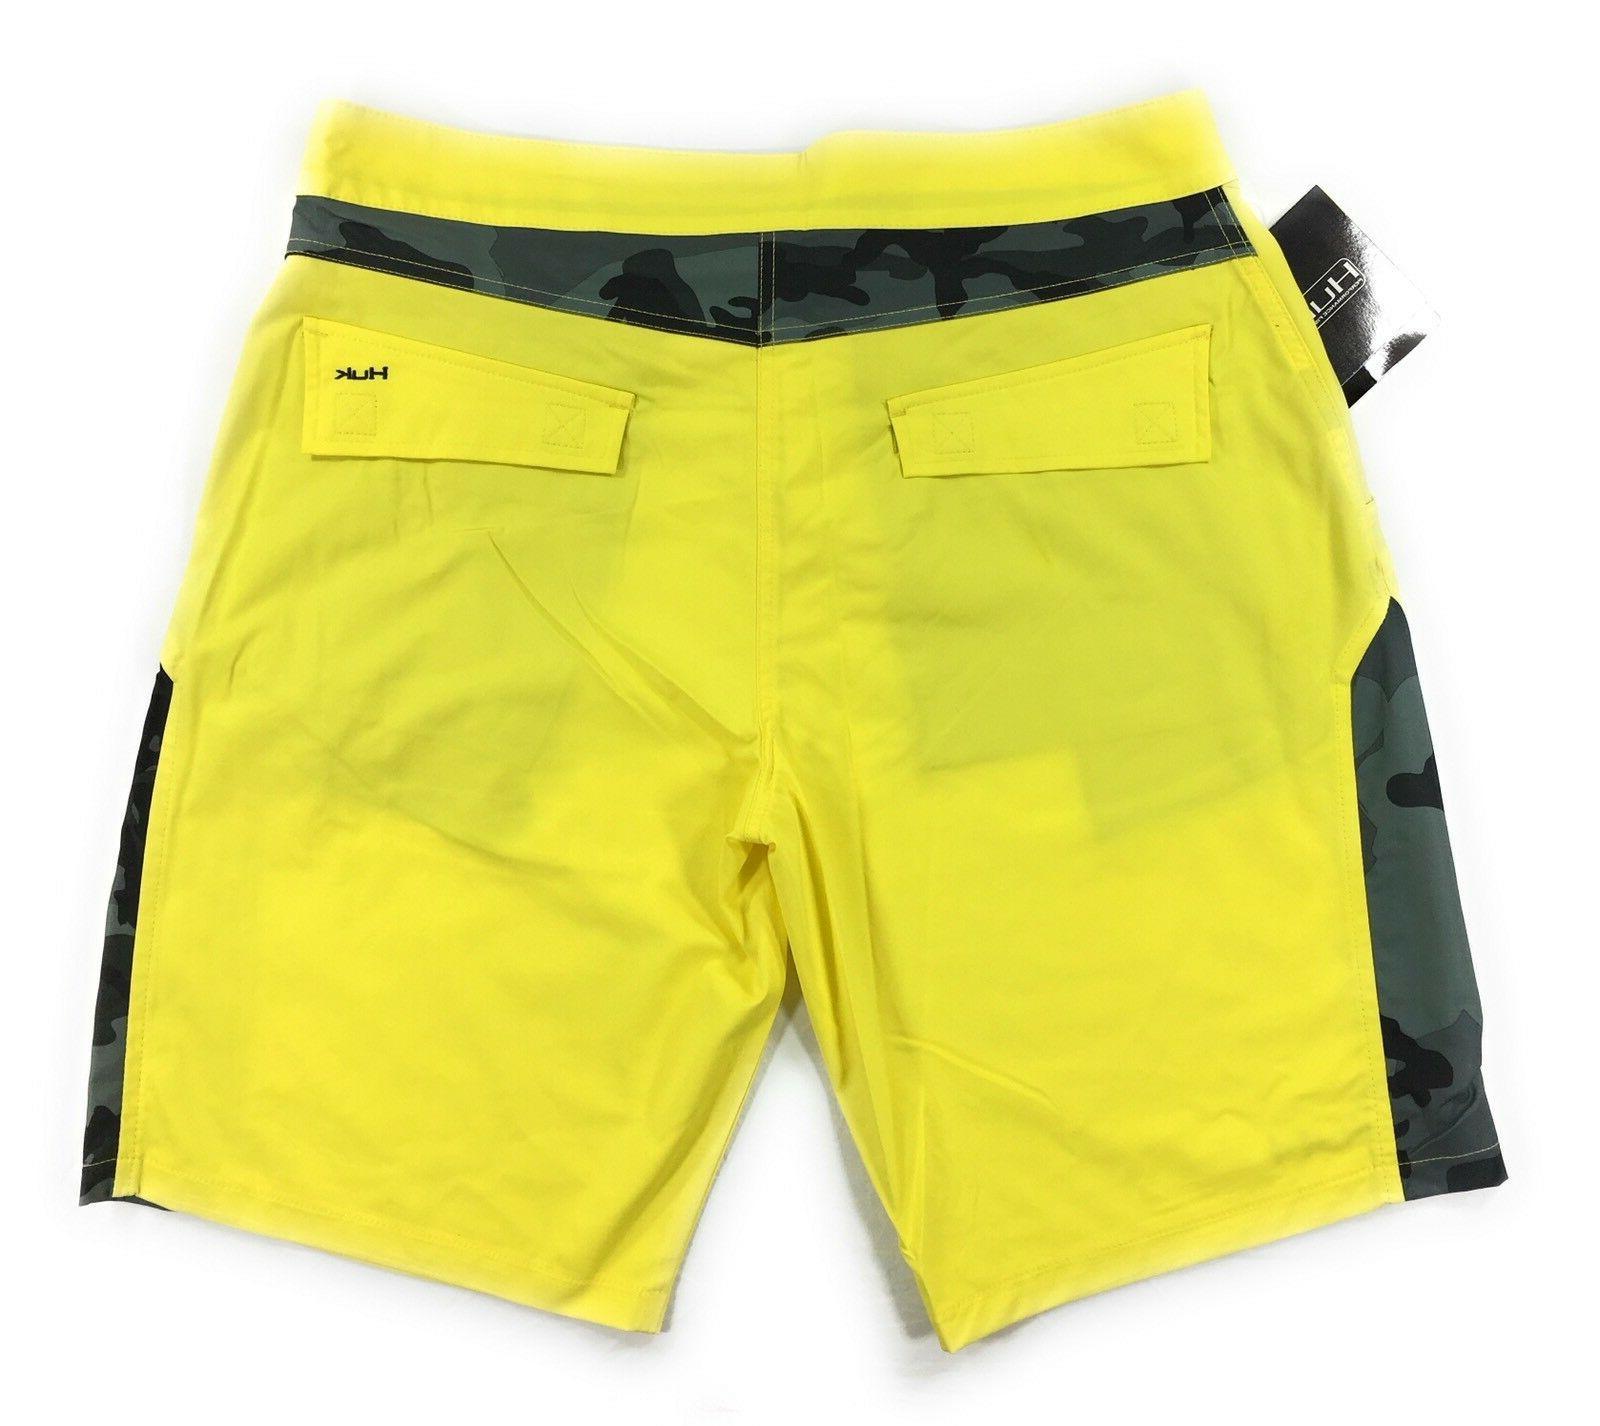 Huk Fishing Camo Boardshorts Mens Yellow Quick Dry